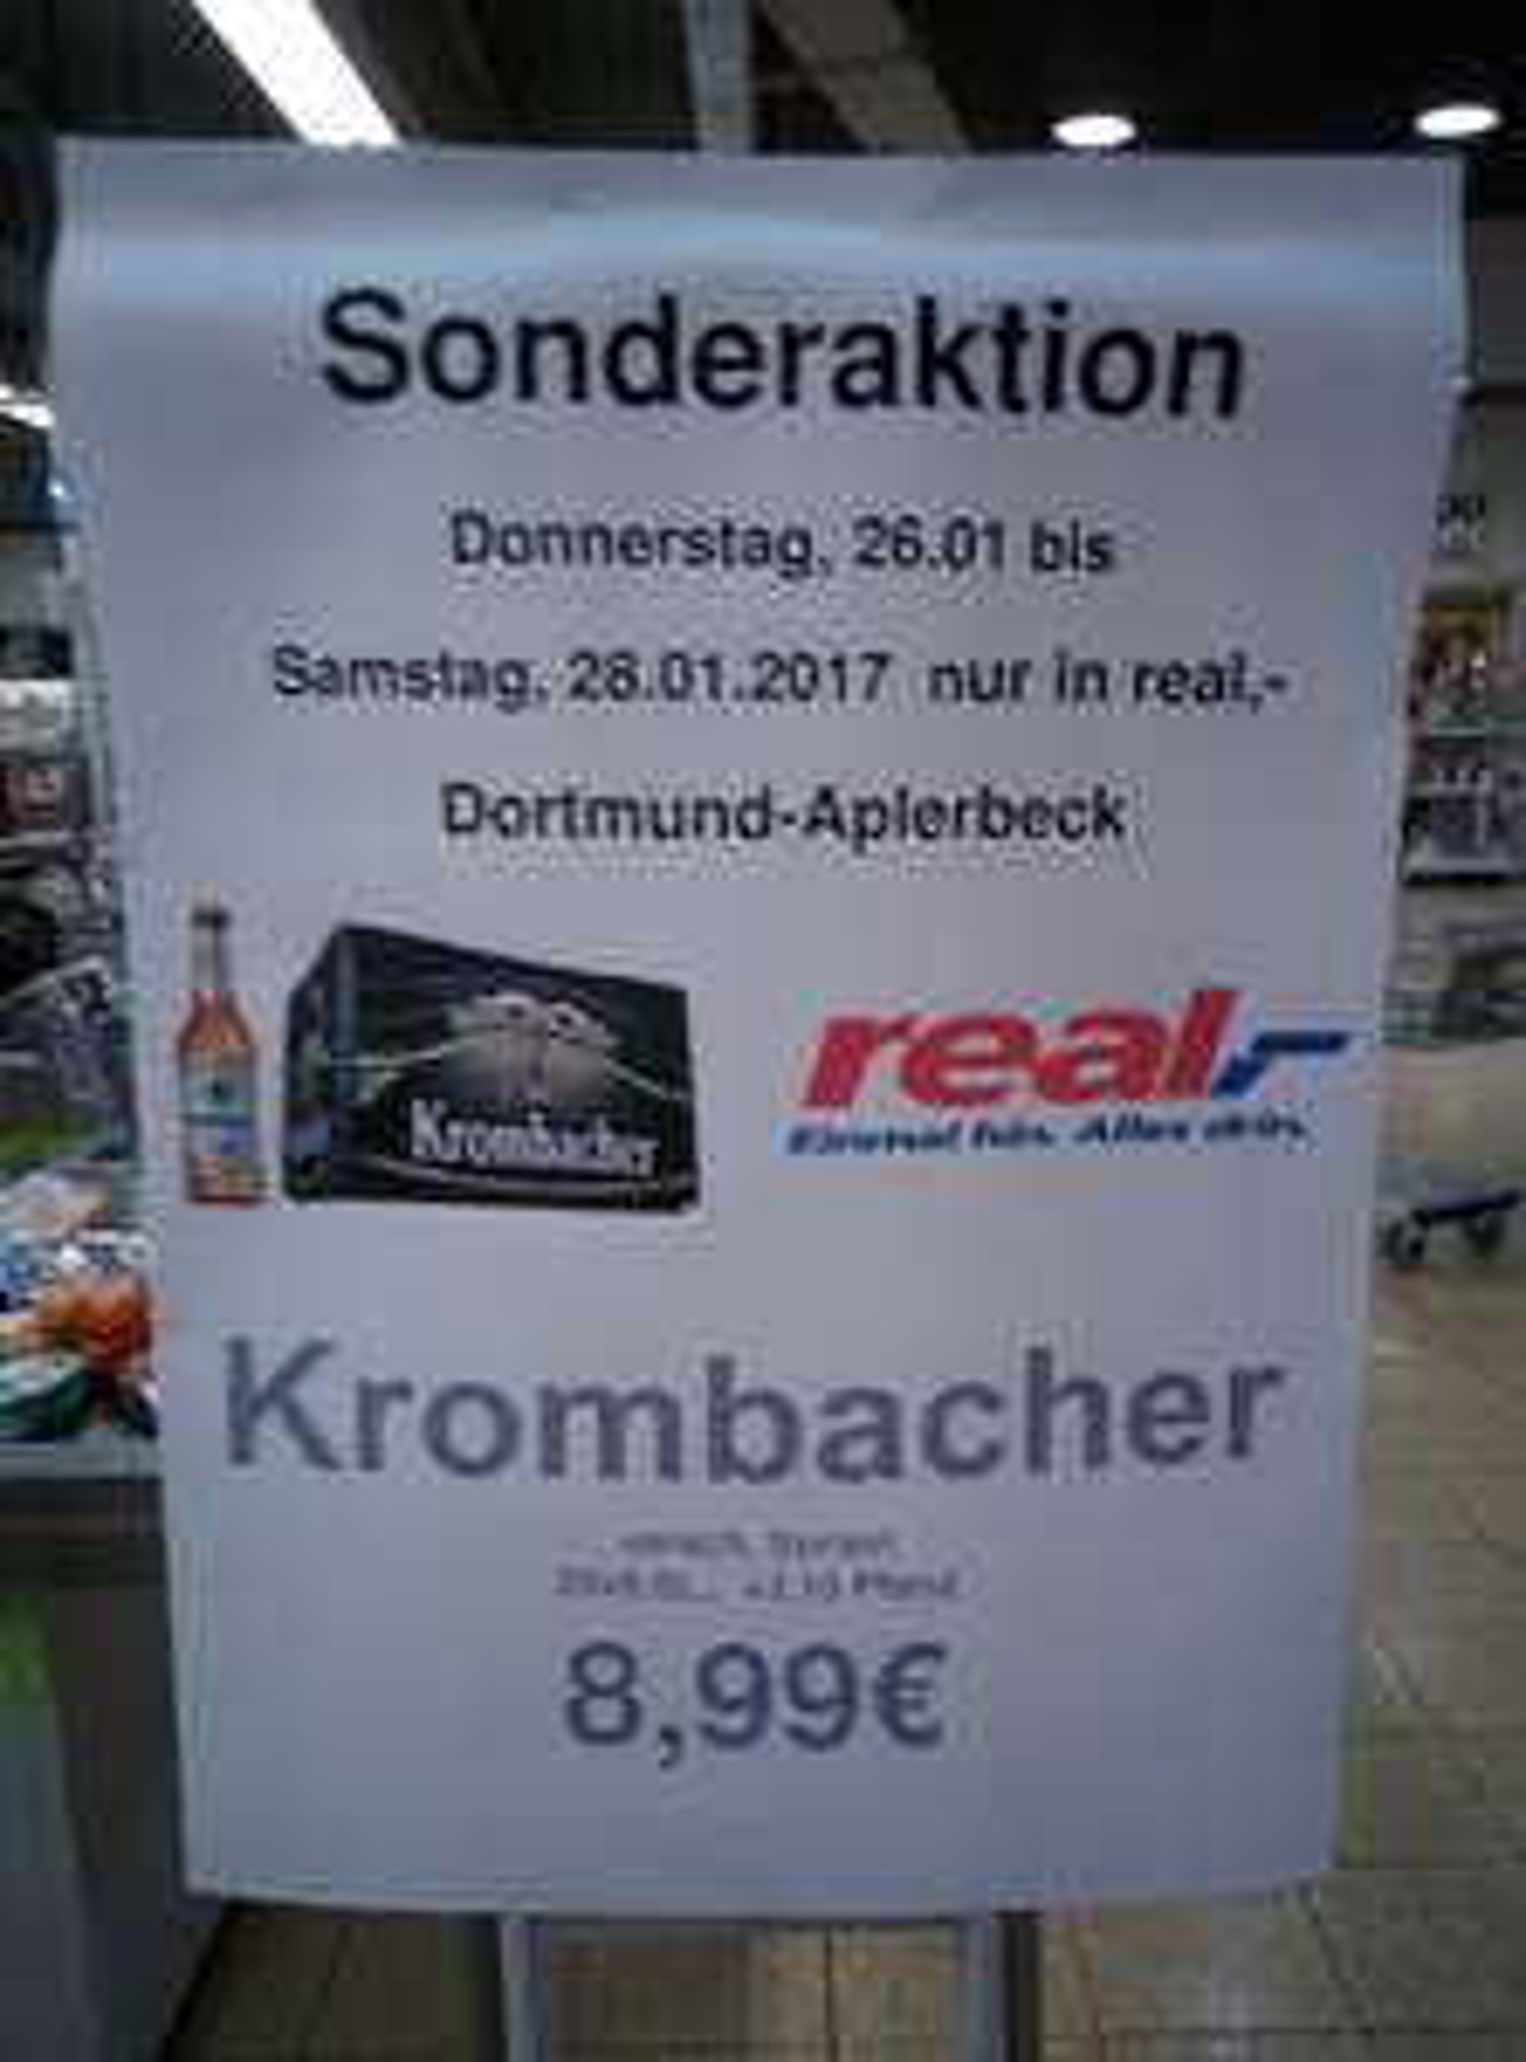 [LOKAL] Krombacher verschiedene Sorten 8,99€ die Kiste im Real Dortmund-Aplerbeck